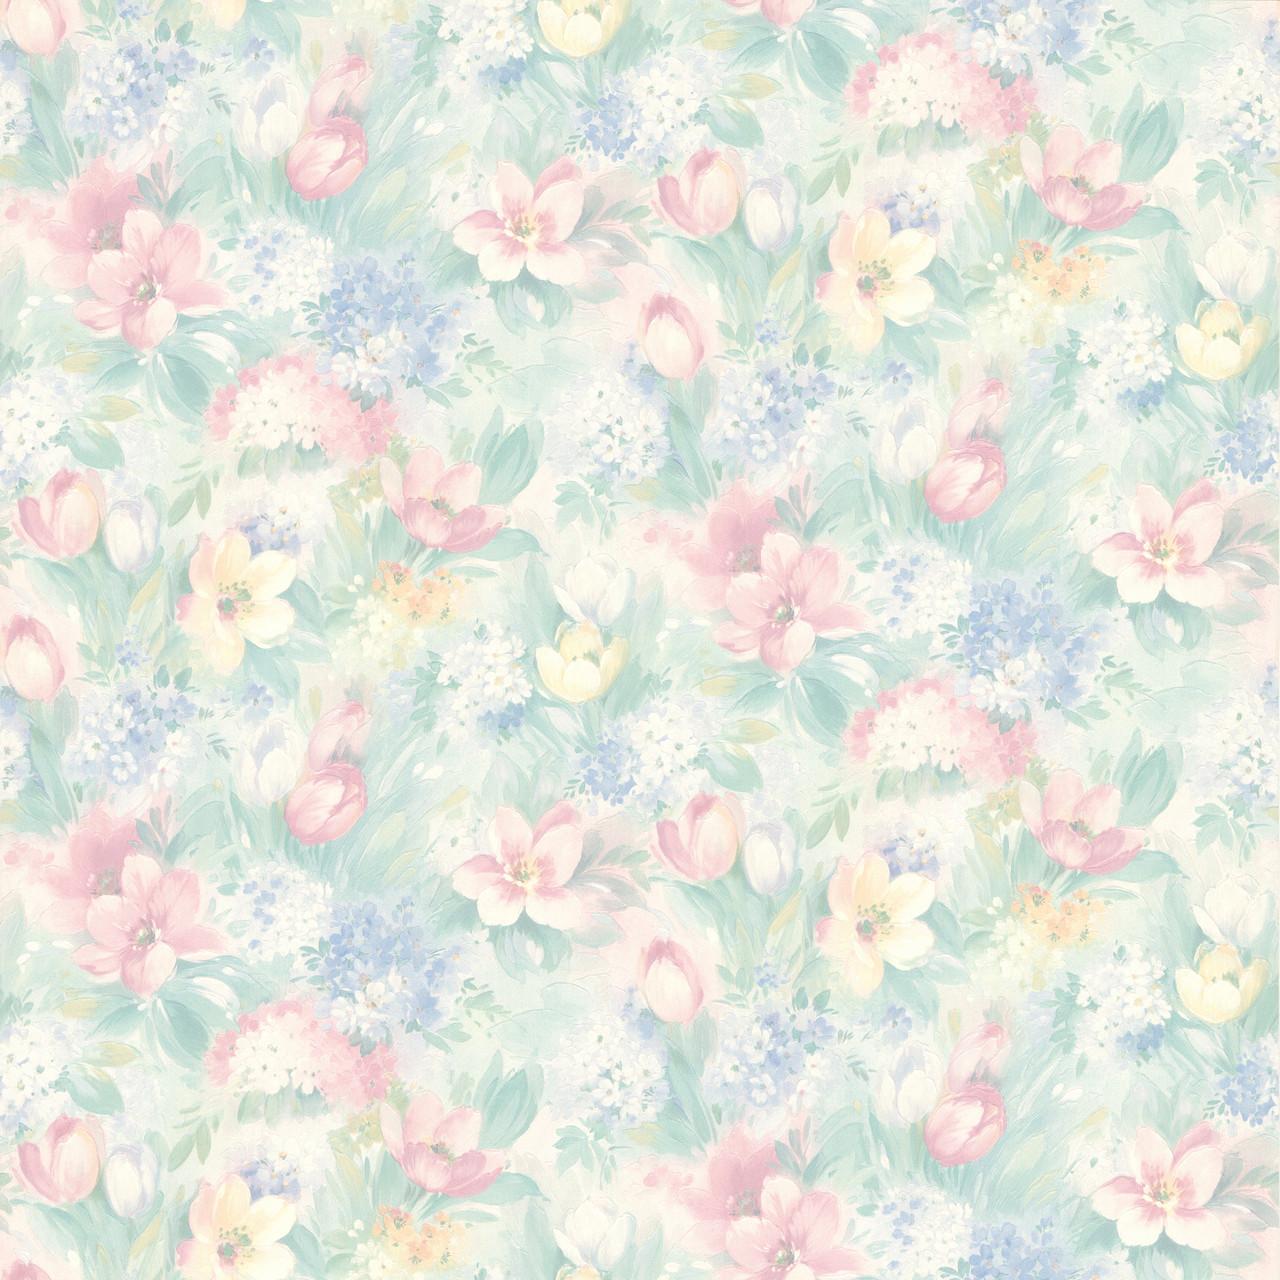 414 75868 Georgia Pastel Floral Motif Wallpaper